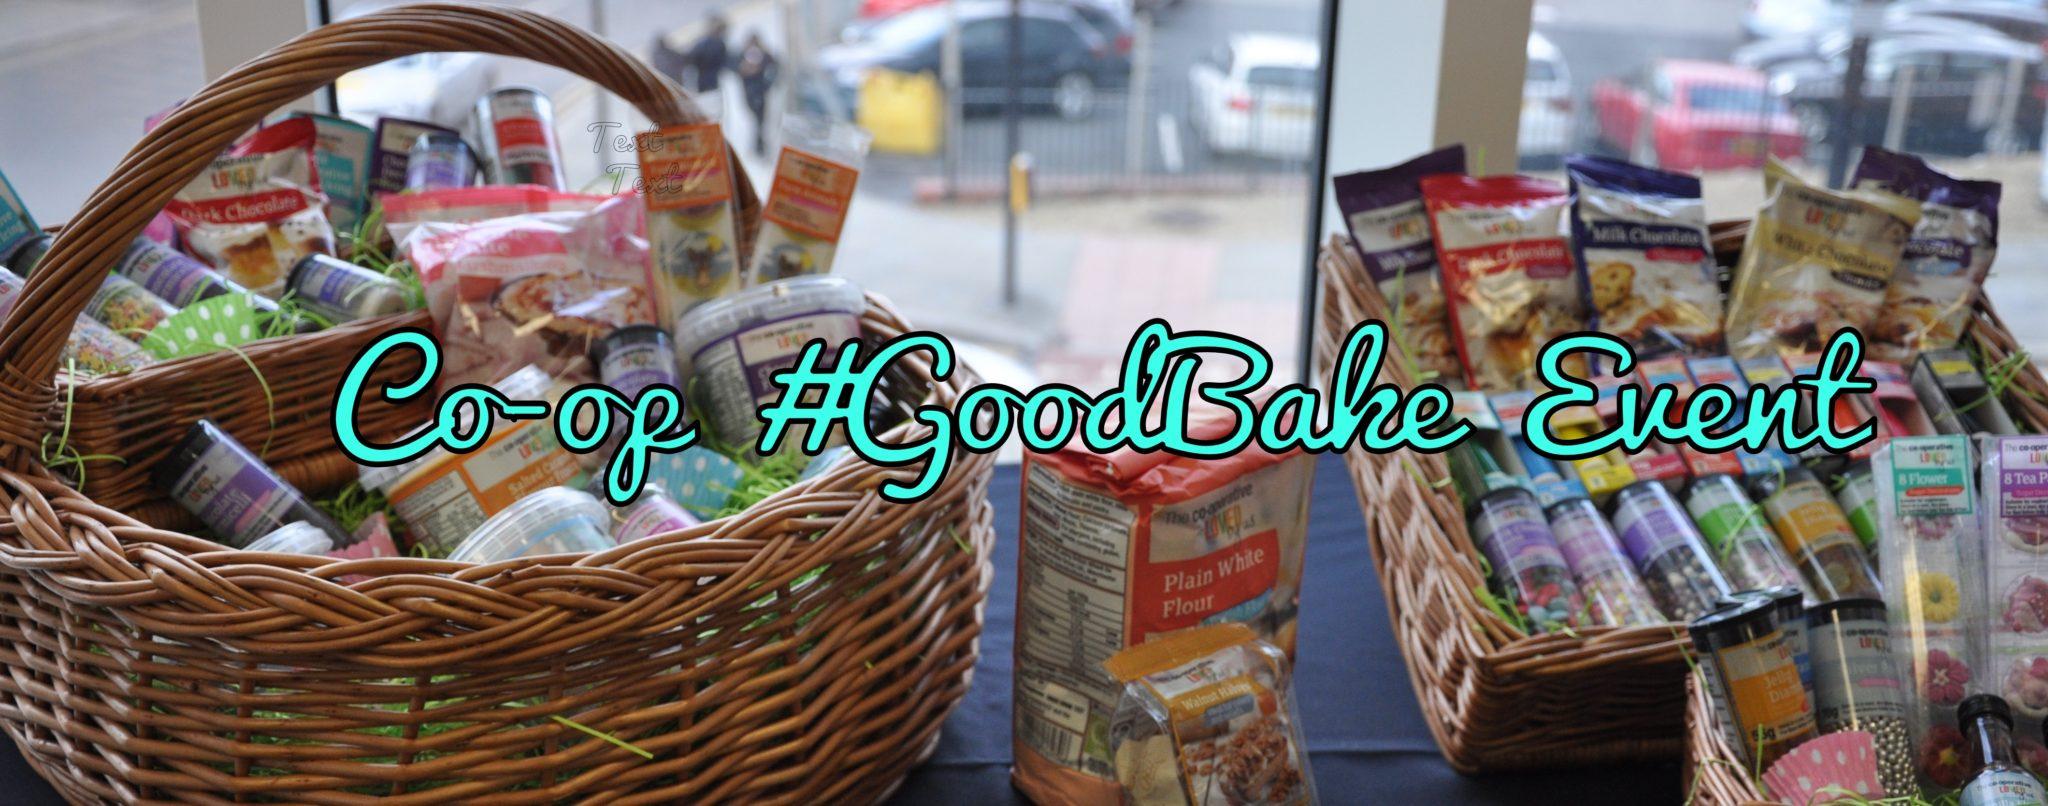 Co-op Good Bake Event_Miss Pond